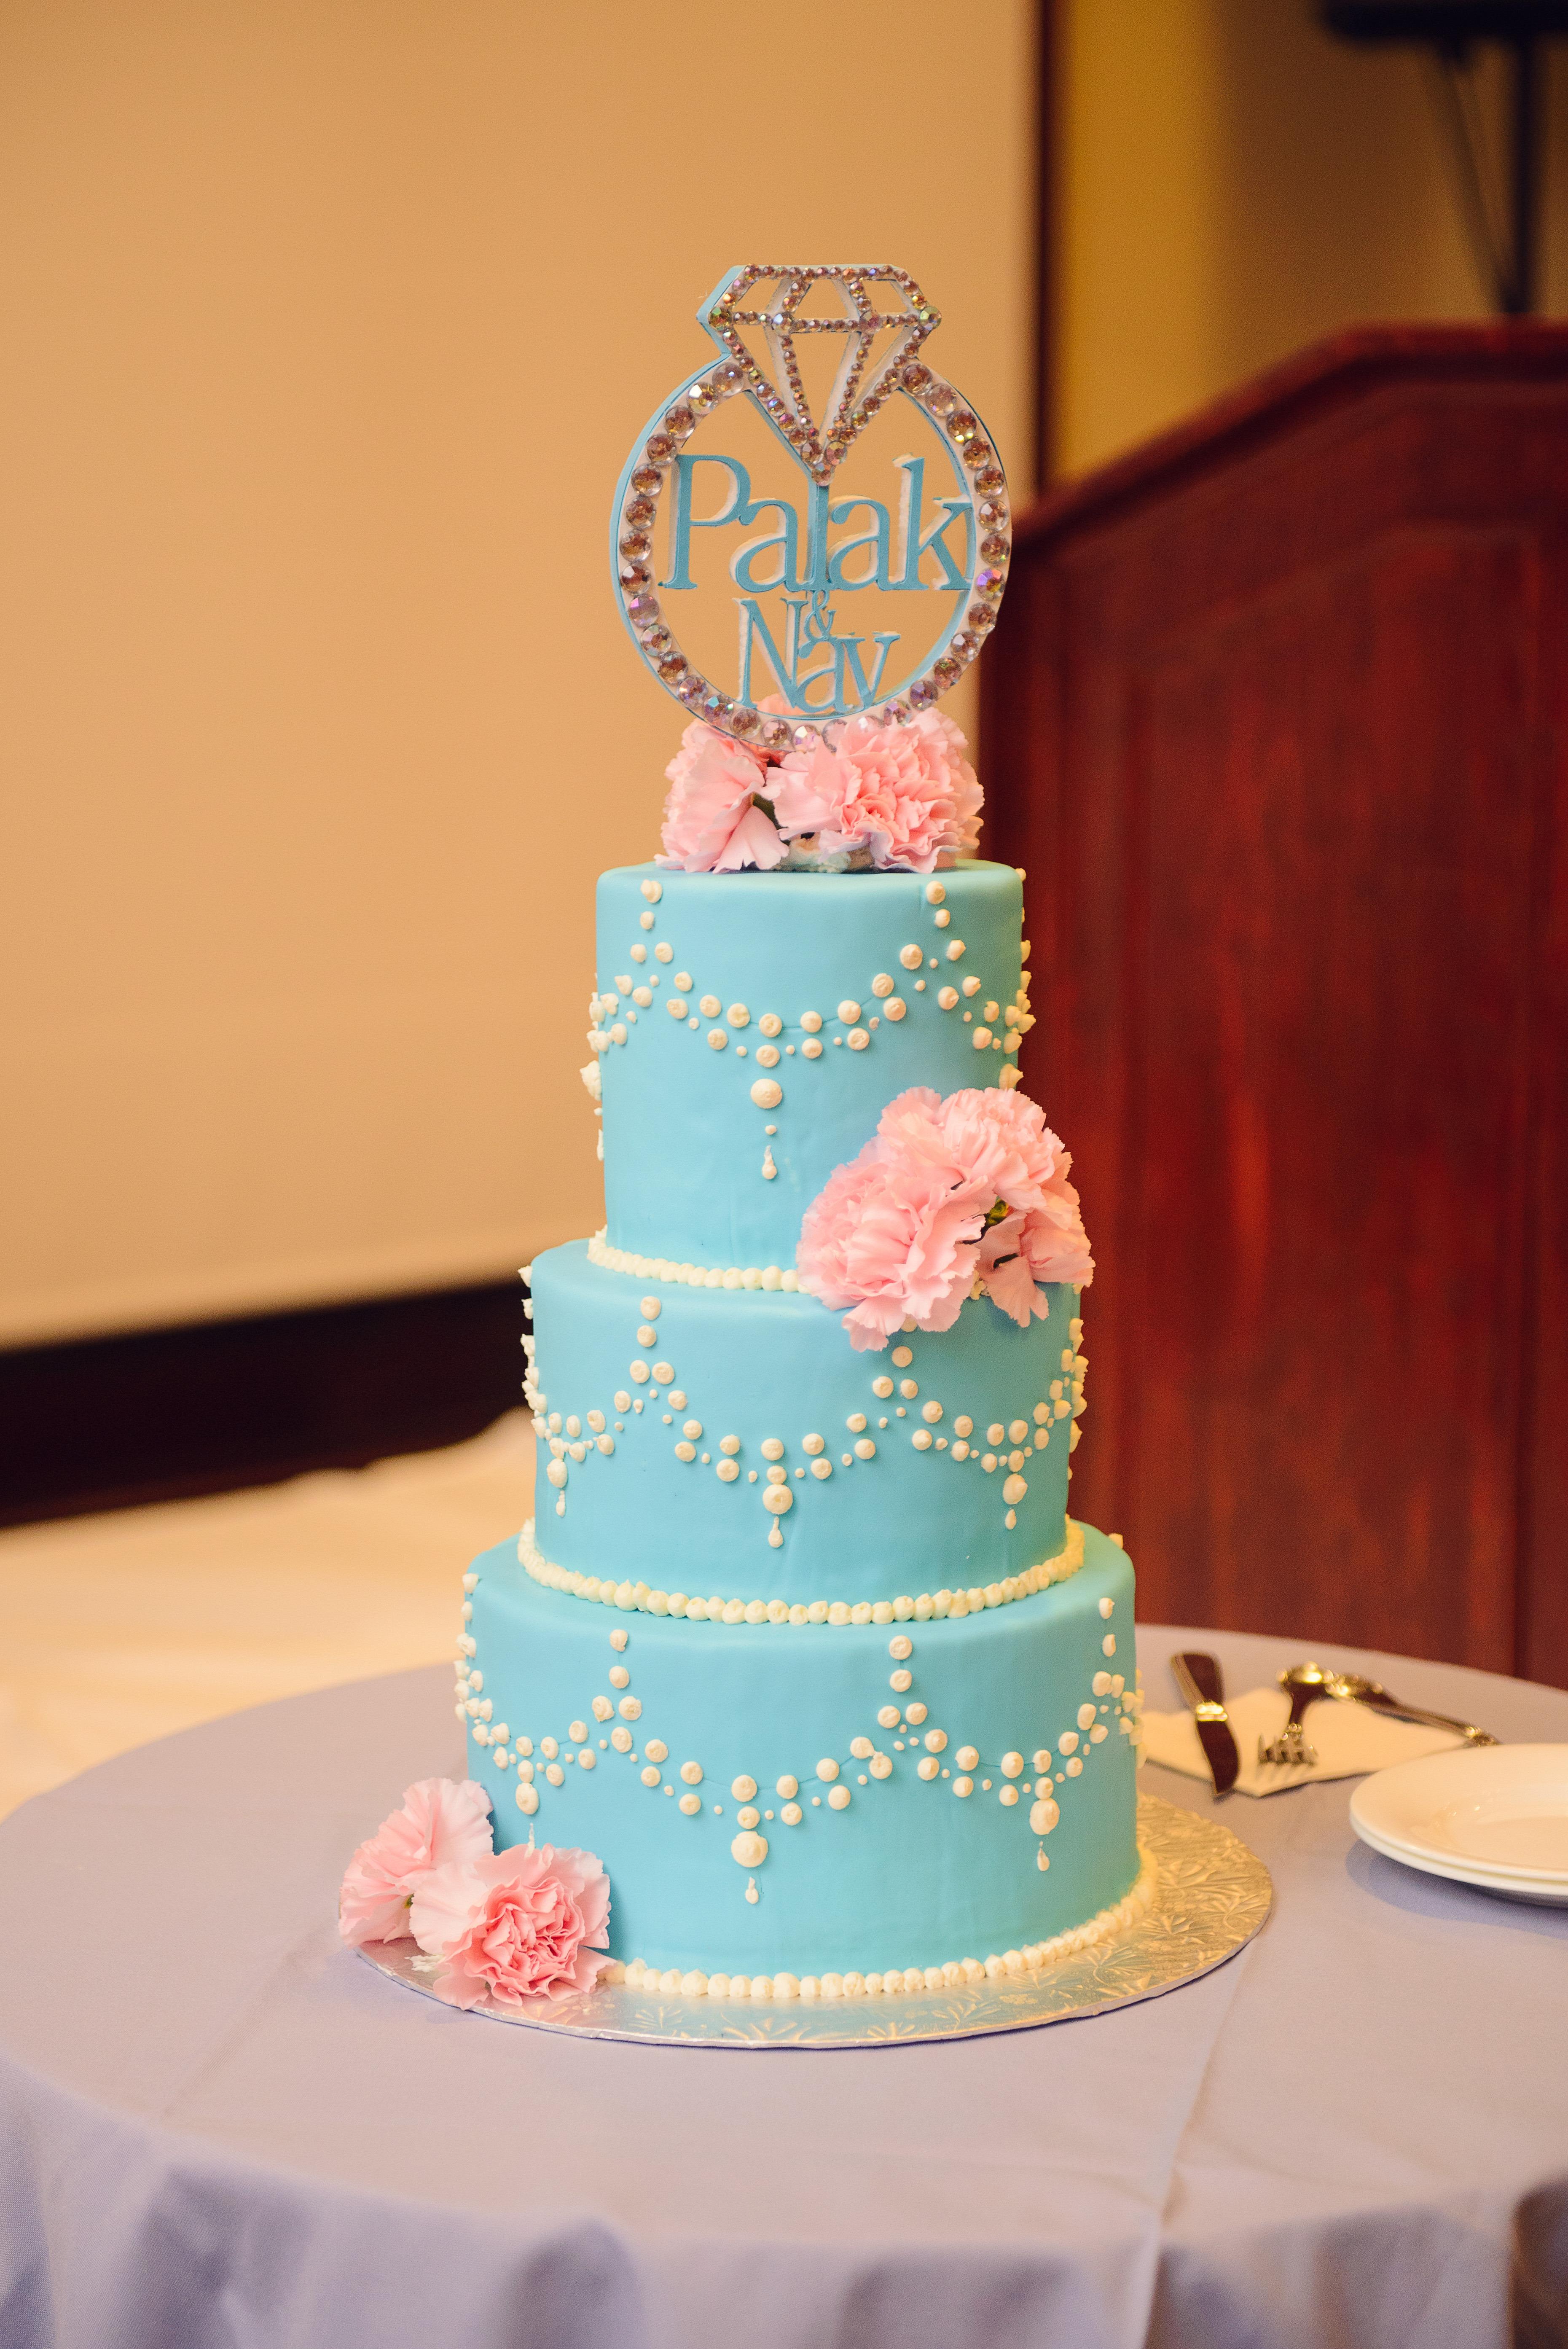 Halal Cake Toronto